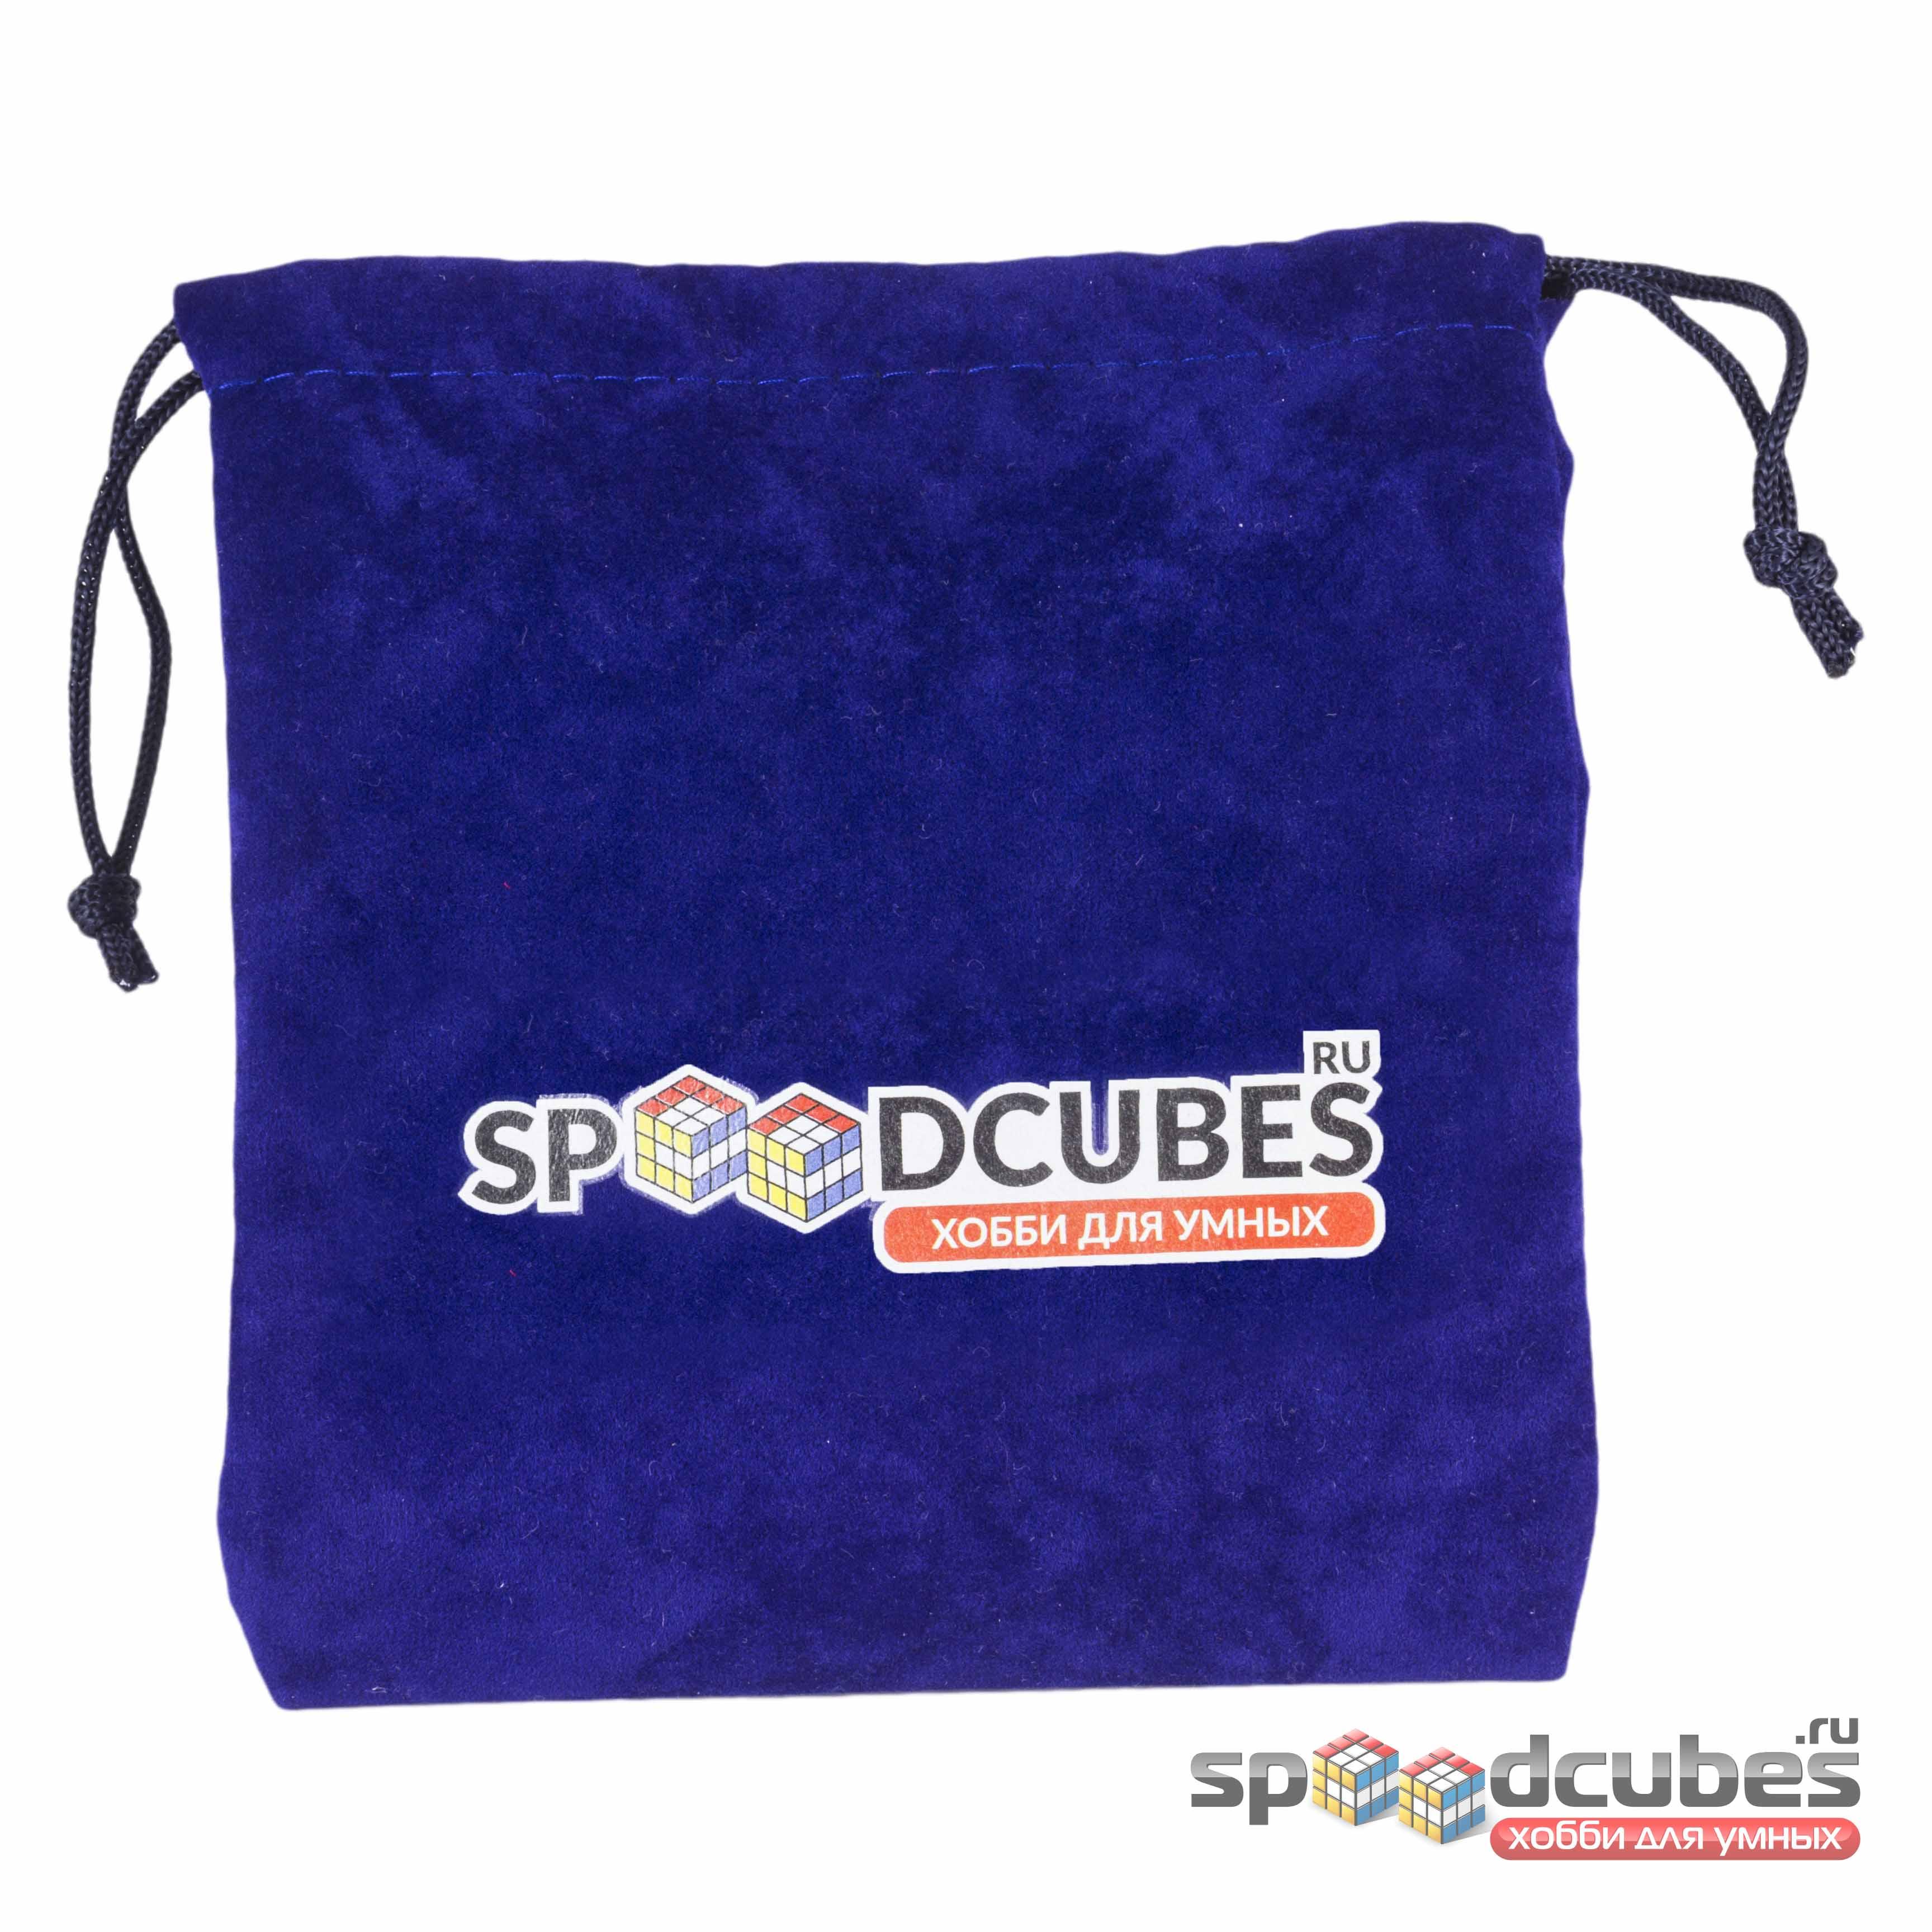 Фирменный чехол для кубов от 2х2 до 7х7 от SPEEDCUBES